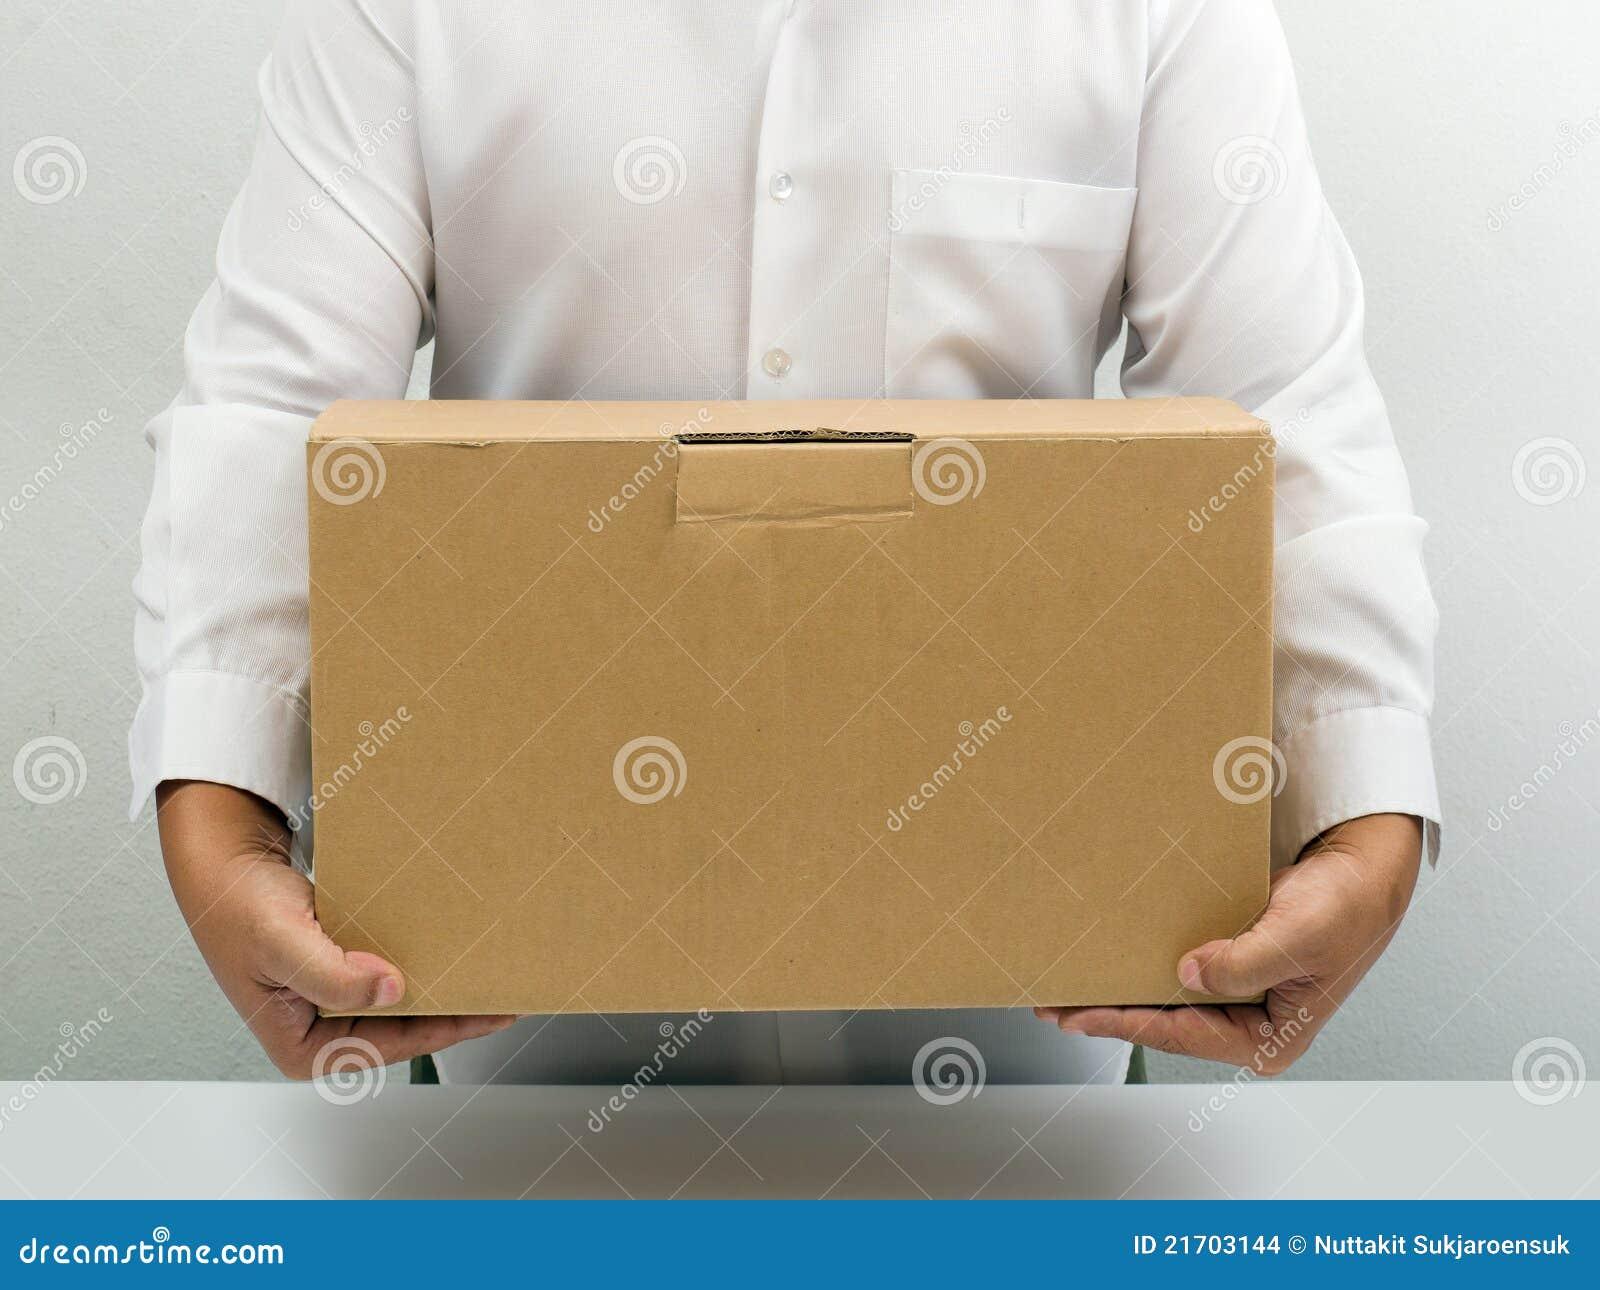 the box man essay